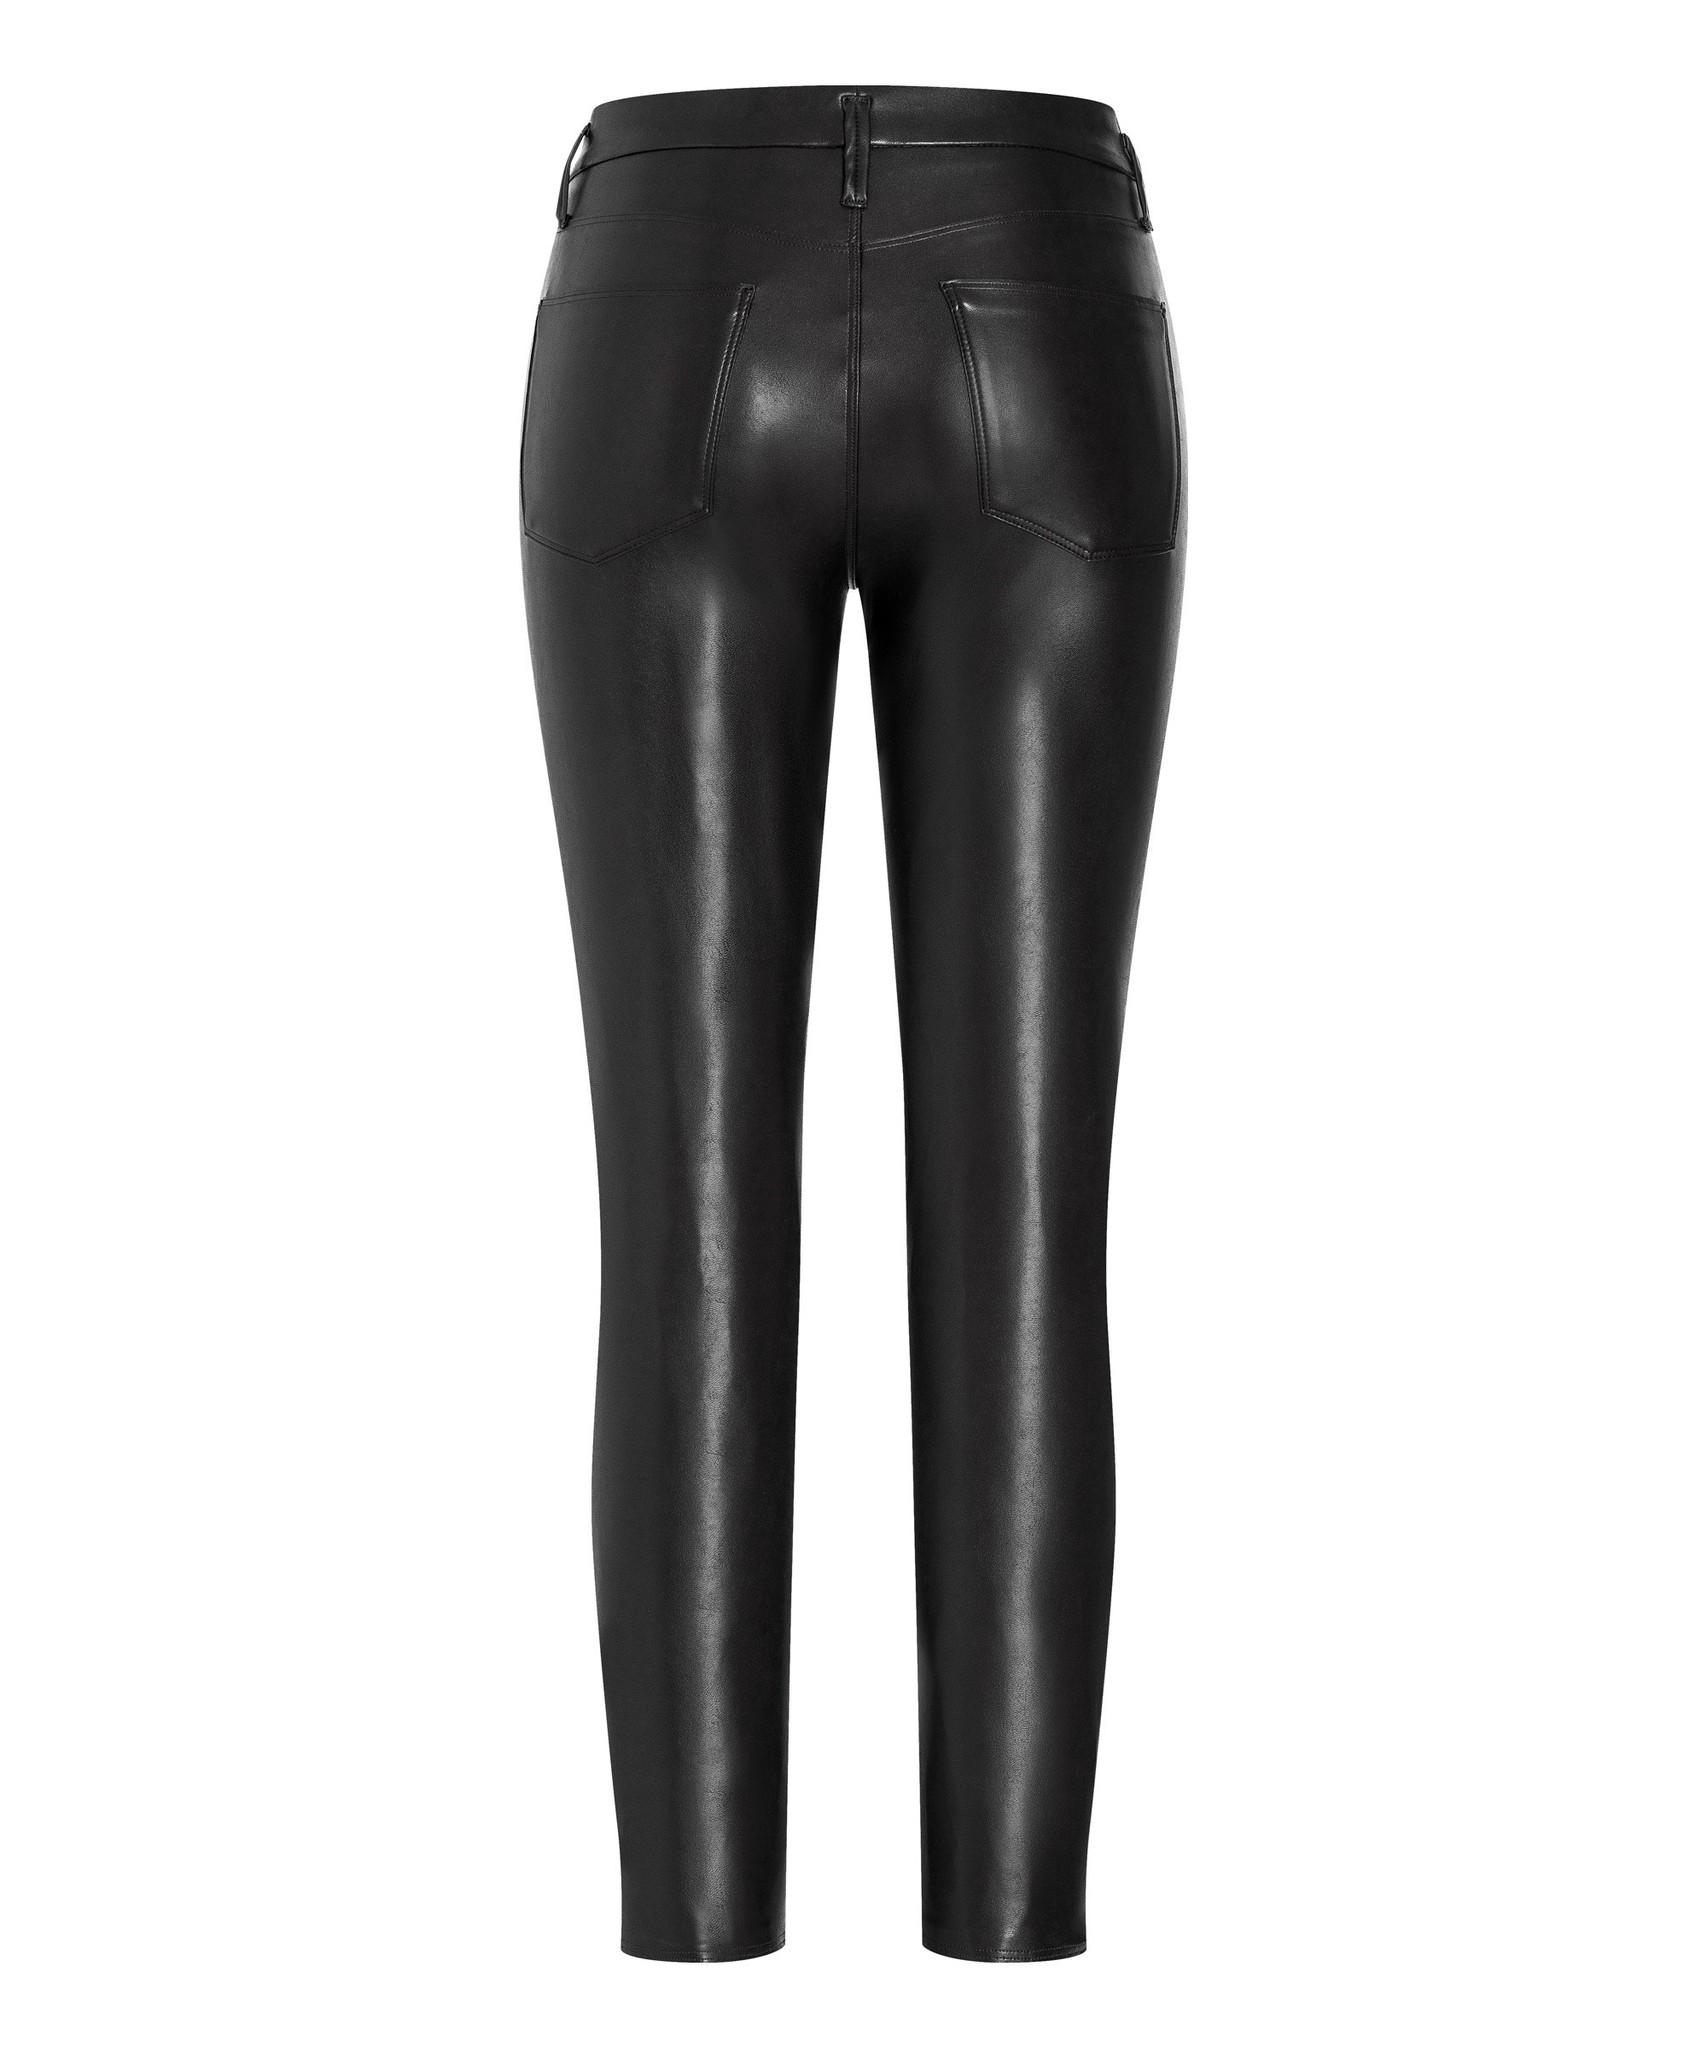 Cambio Nappa leatherpants RAY 6301-2